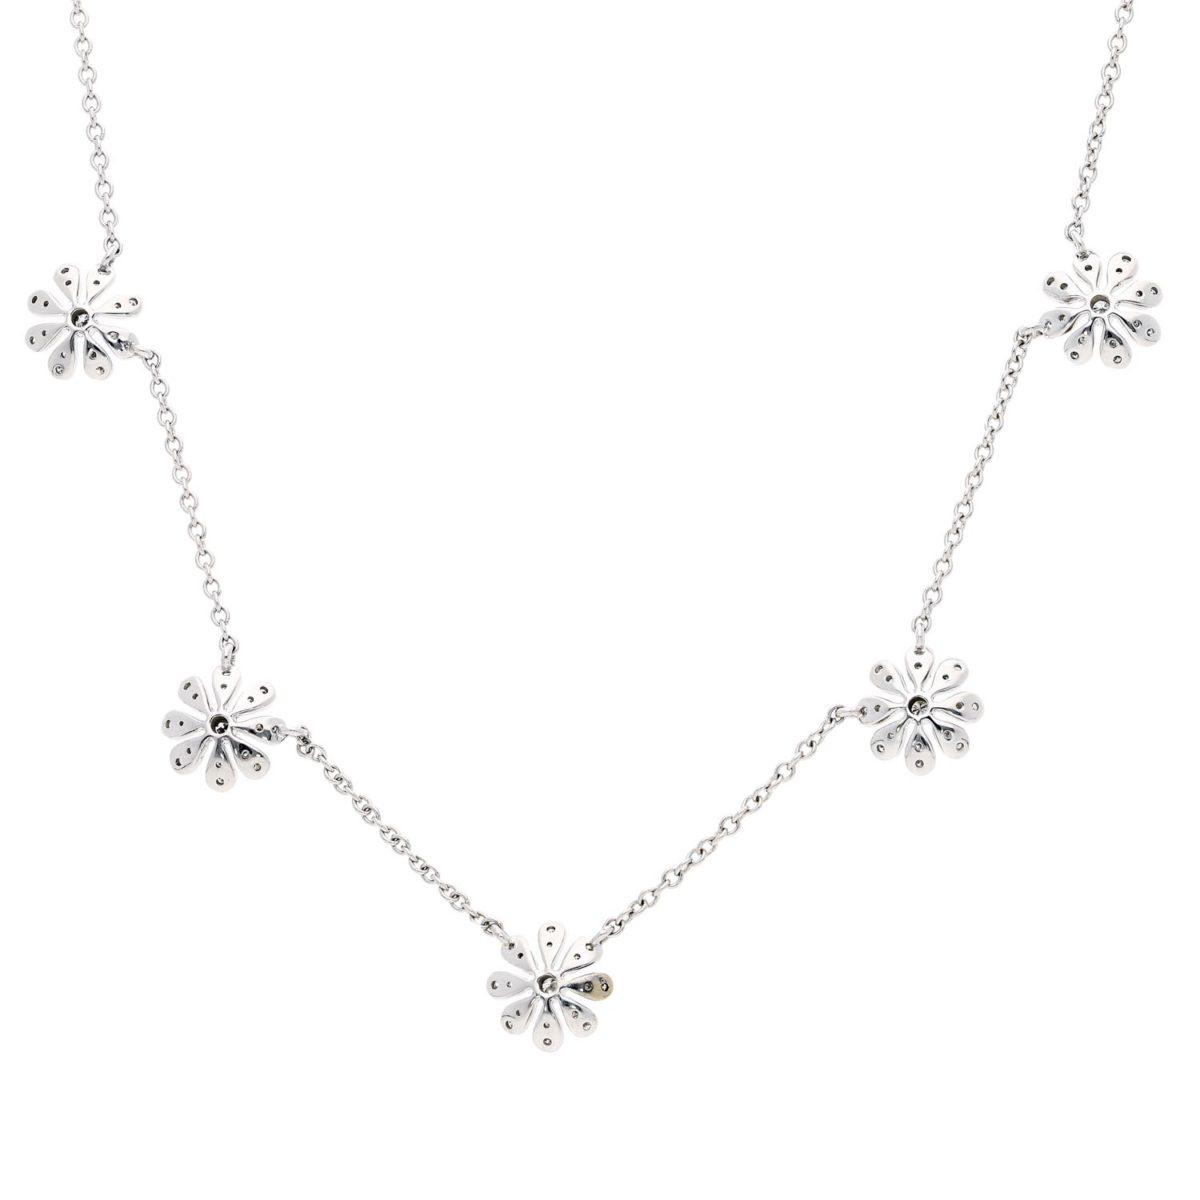 Diamond NecklaceStyle #: ROY-WC8037D